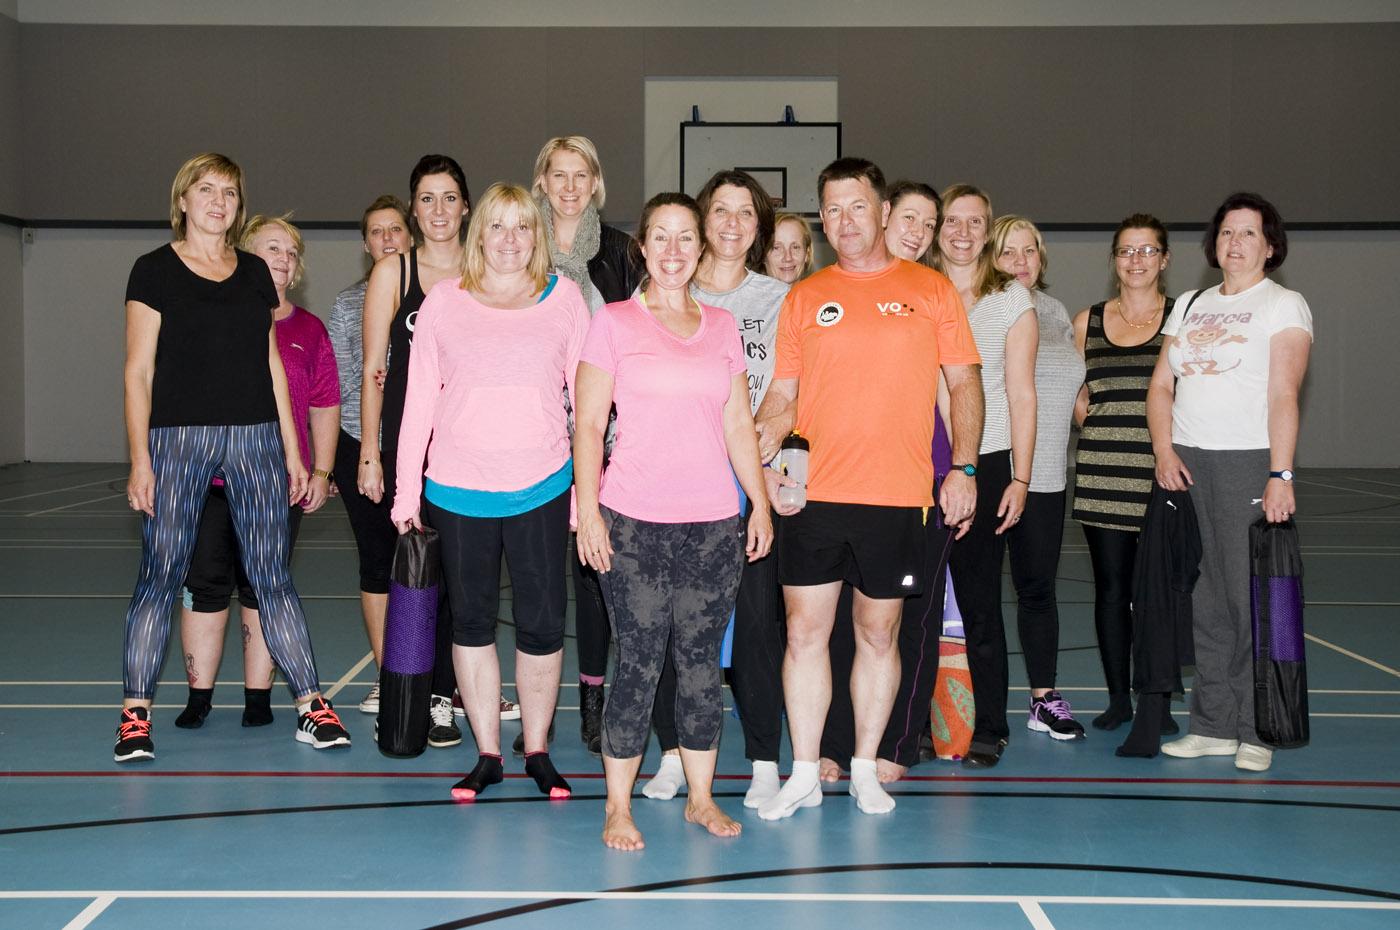 Jane Mackenzie's Health and Fitness